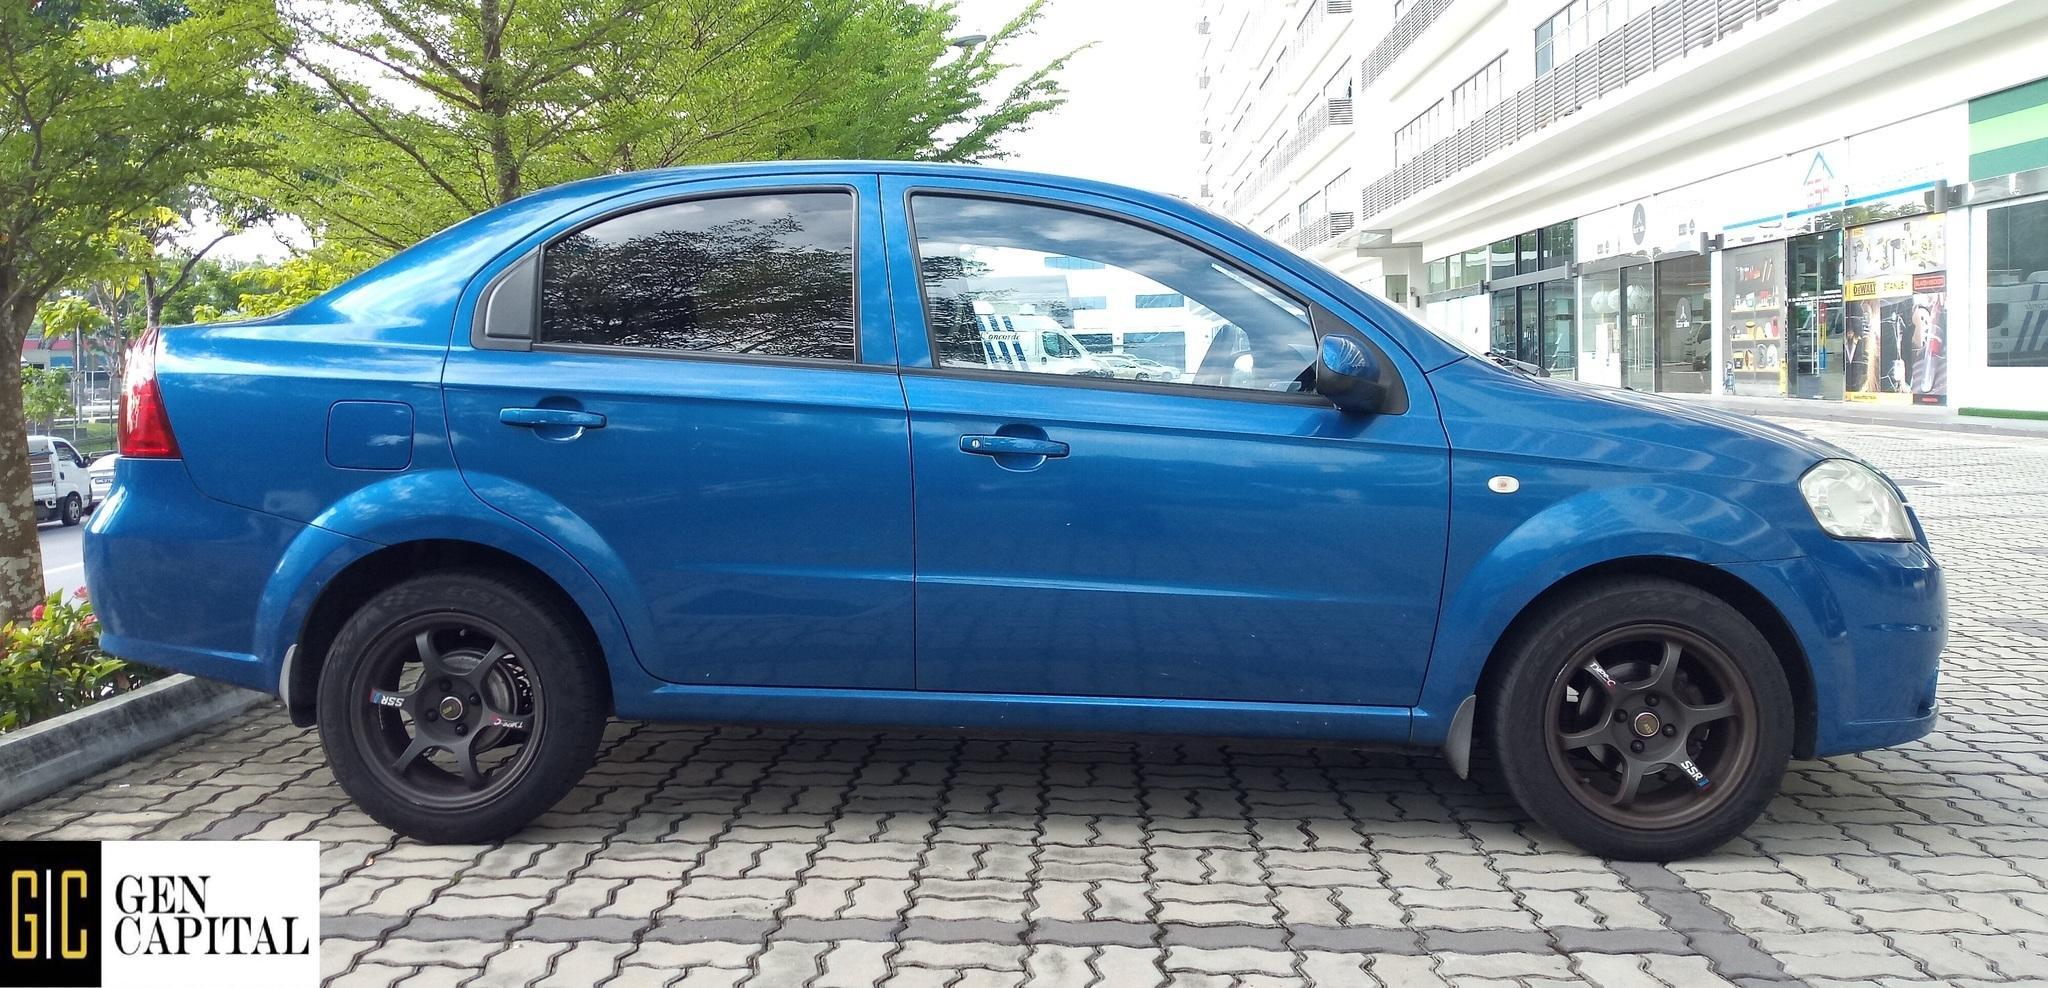 Chevrolet Aevo 1.4A Grab Gojek Ryde Tada Friendly & Non PHV Car Rental